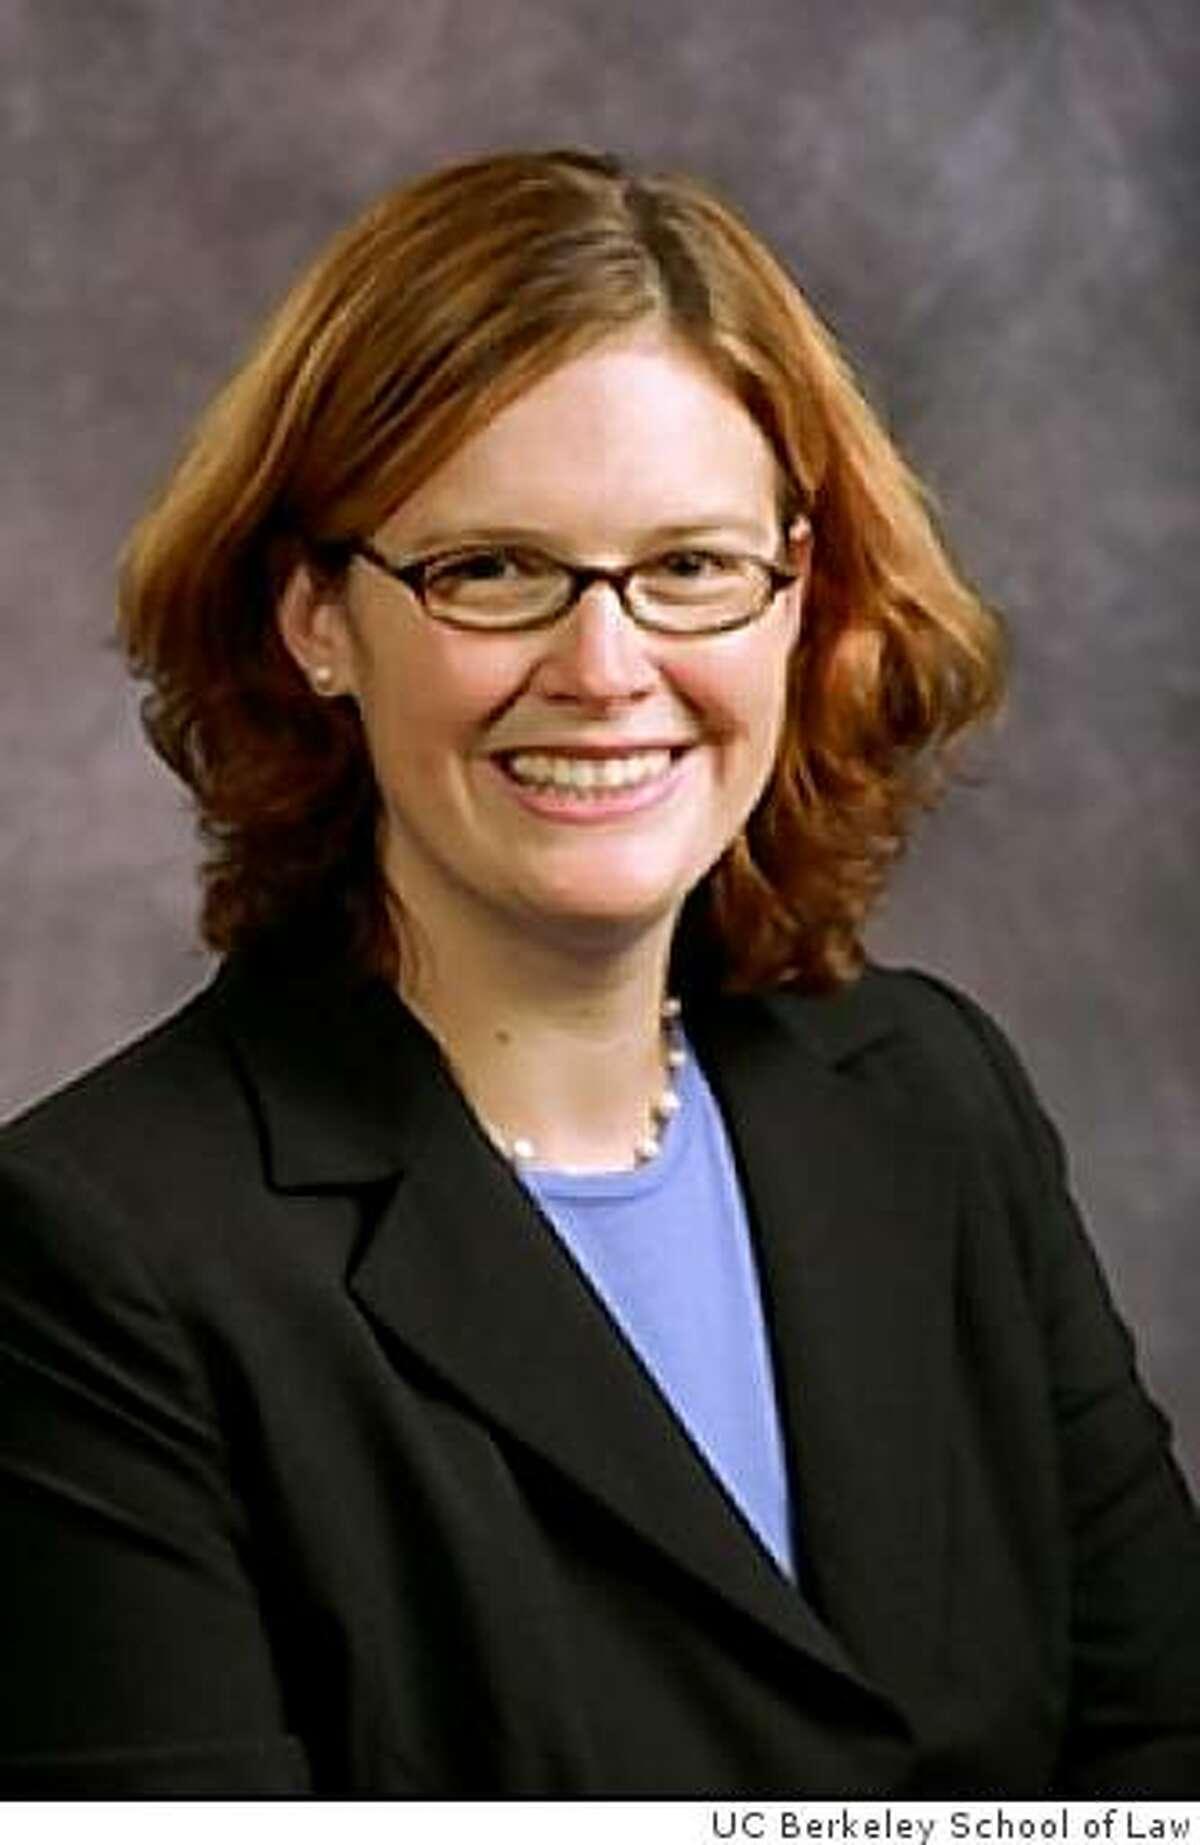 Erin Murphy is a professor of law at UC Berkeley School of Law.